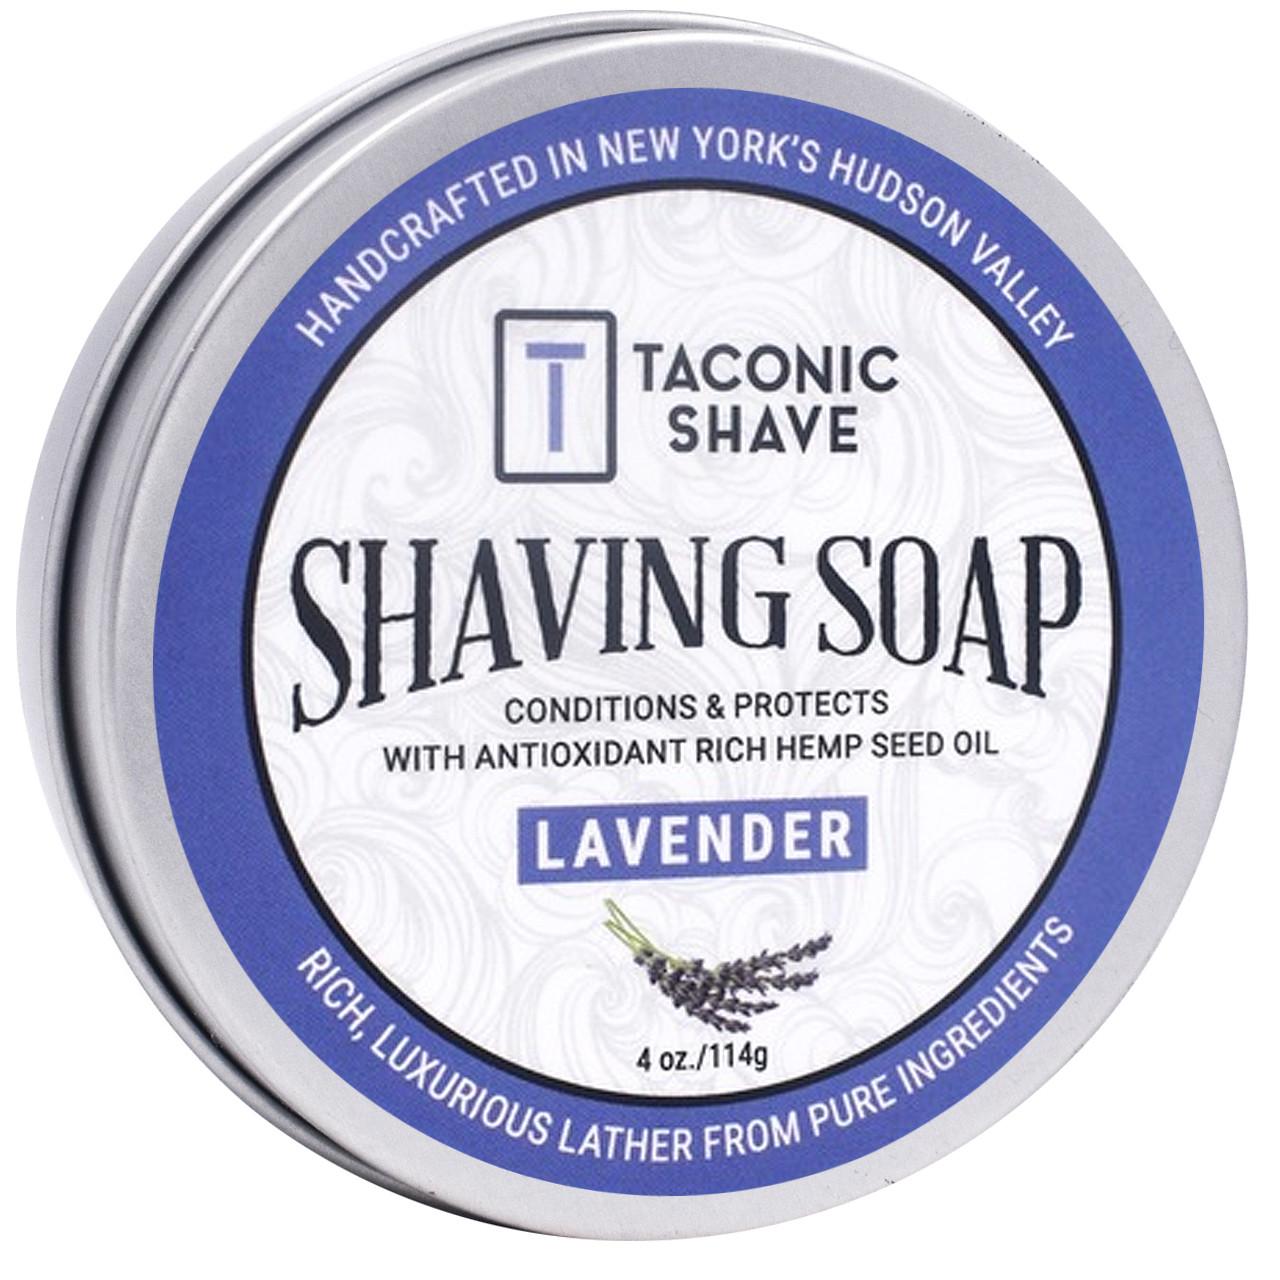 Taconic Shave Soap Lavender 4oz